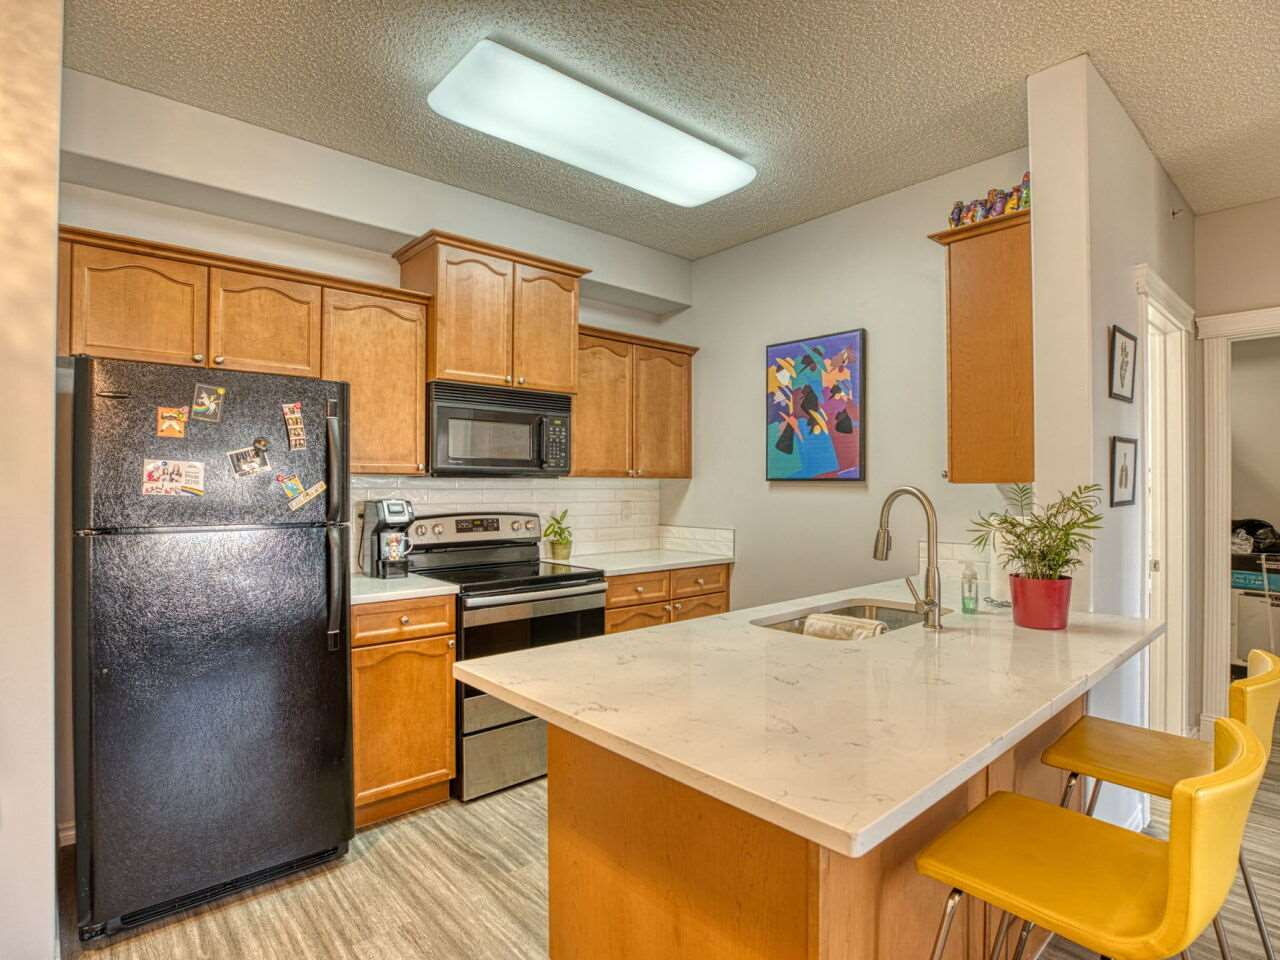 429 16807 100 Avenue - Glenwood_EDMO Lowrise Apartment for sale, 2 Bedrooms (E4234341) #9